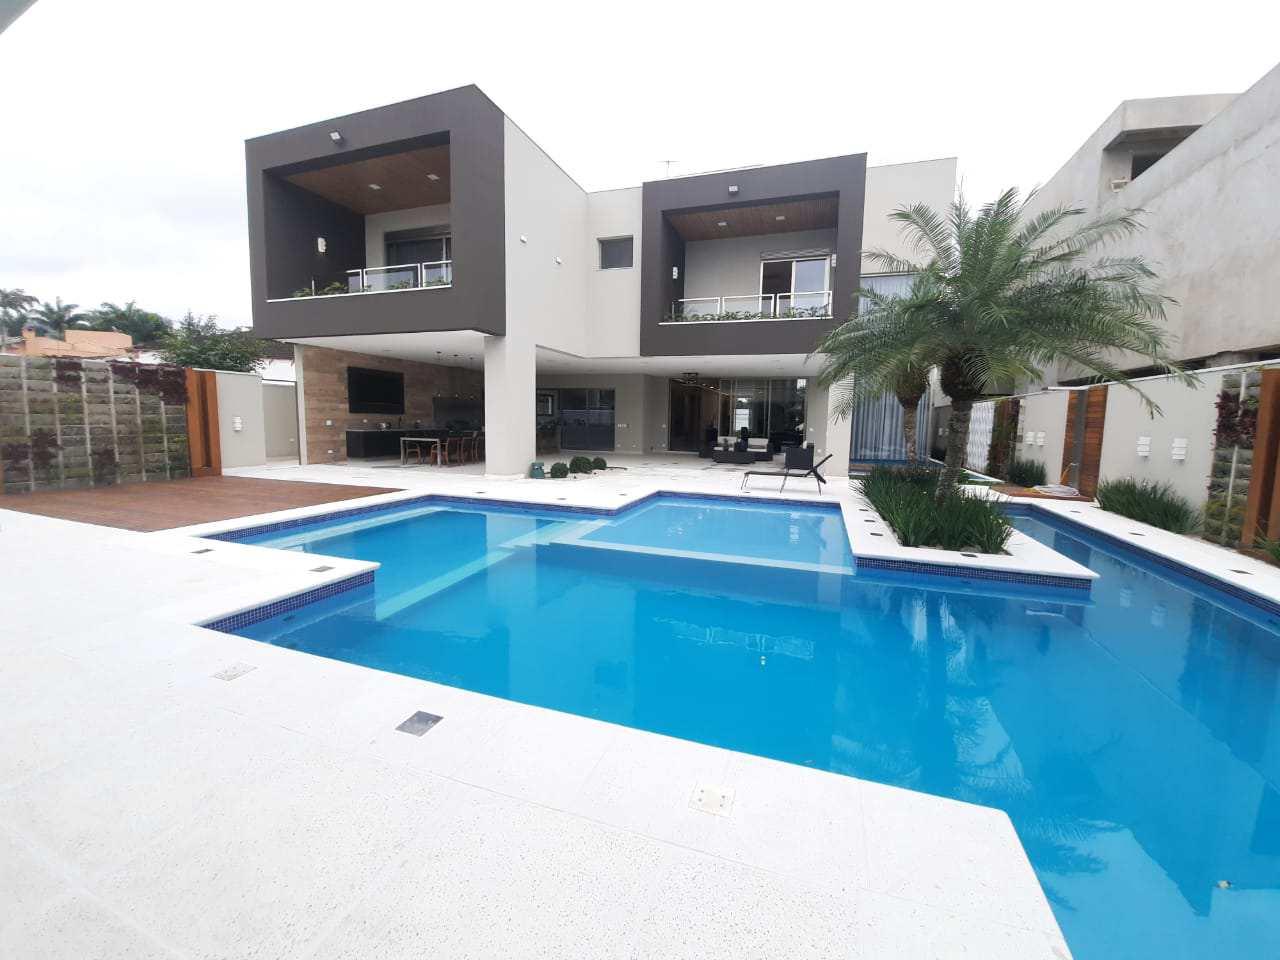 Casa de Condomínio com 6 dorms, Acapulco, Guarujá - R$ 9.5 mi, Cod: 2945